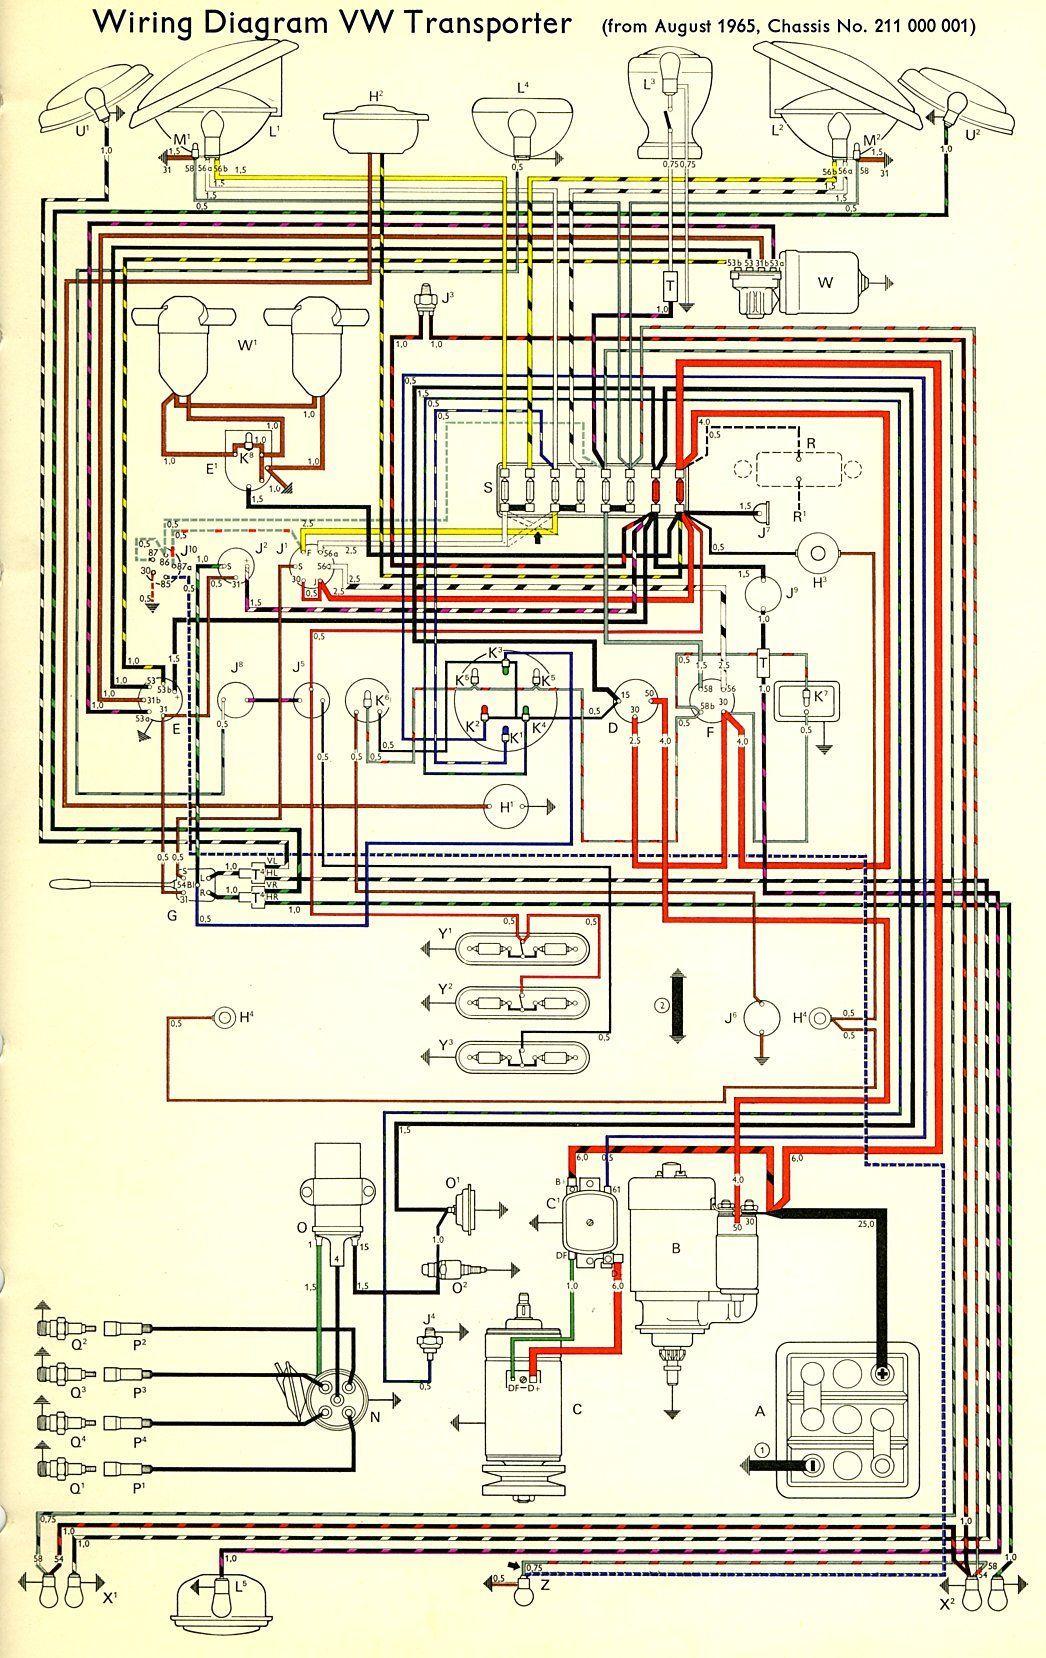 Esquema Electrico 3s Fe Montajes Electricos Diagram Electrical Diagram Wire